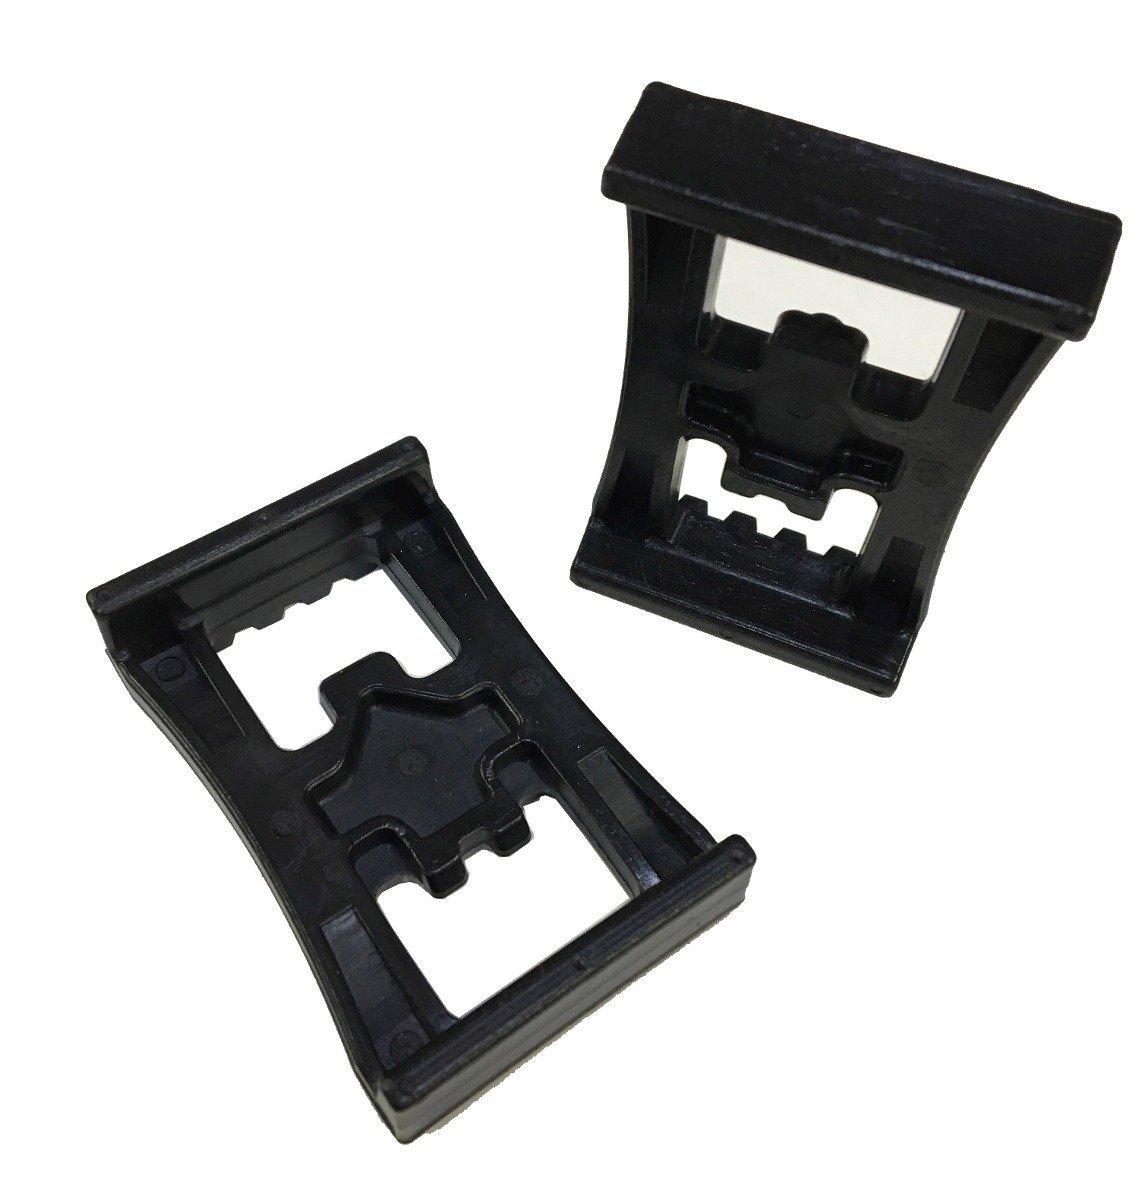 Plataforma Plástica para Pedal Clip Shimano (Tipo PD 22)